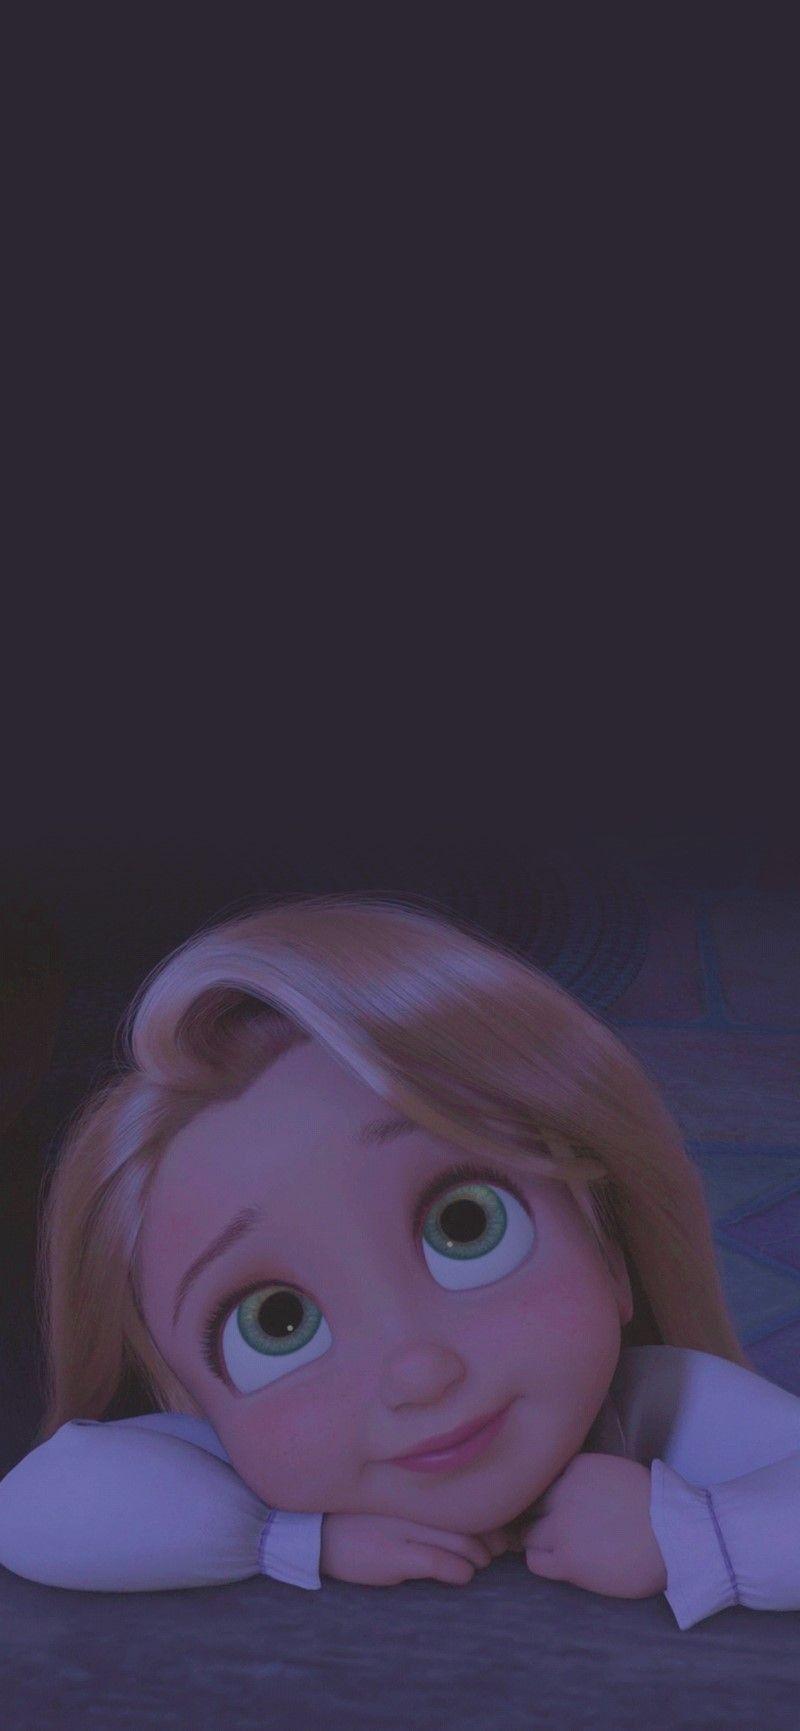 Disney&cartoons wallpapers&backgrounds 💫